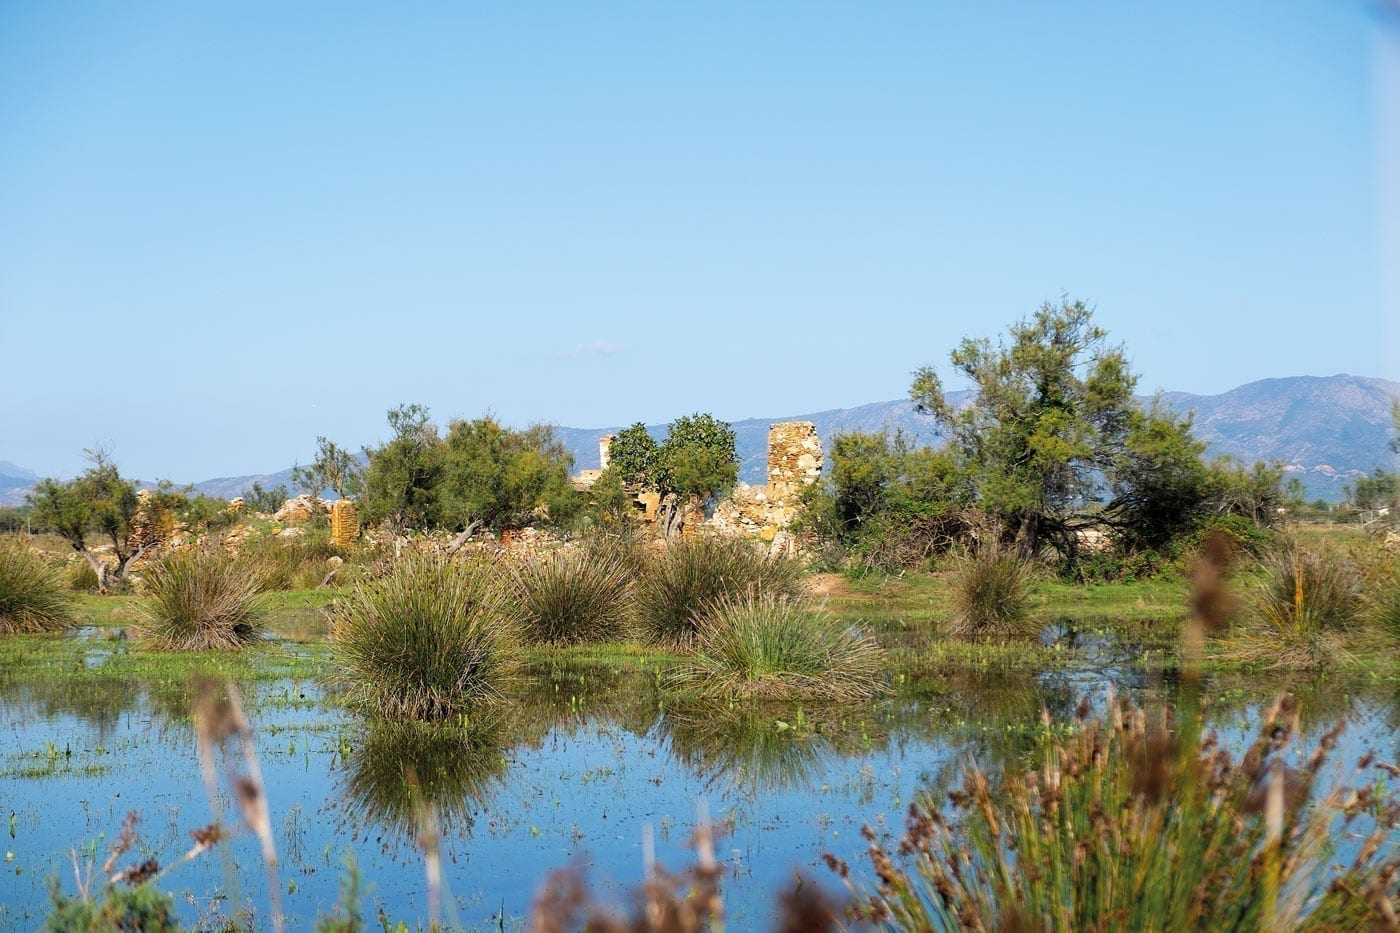 wandern, naturschutzgebiet, naturpark aiguamolls de l'Empordá, mediterran, flamingo, camargue, berge, sumpfgebiet